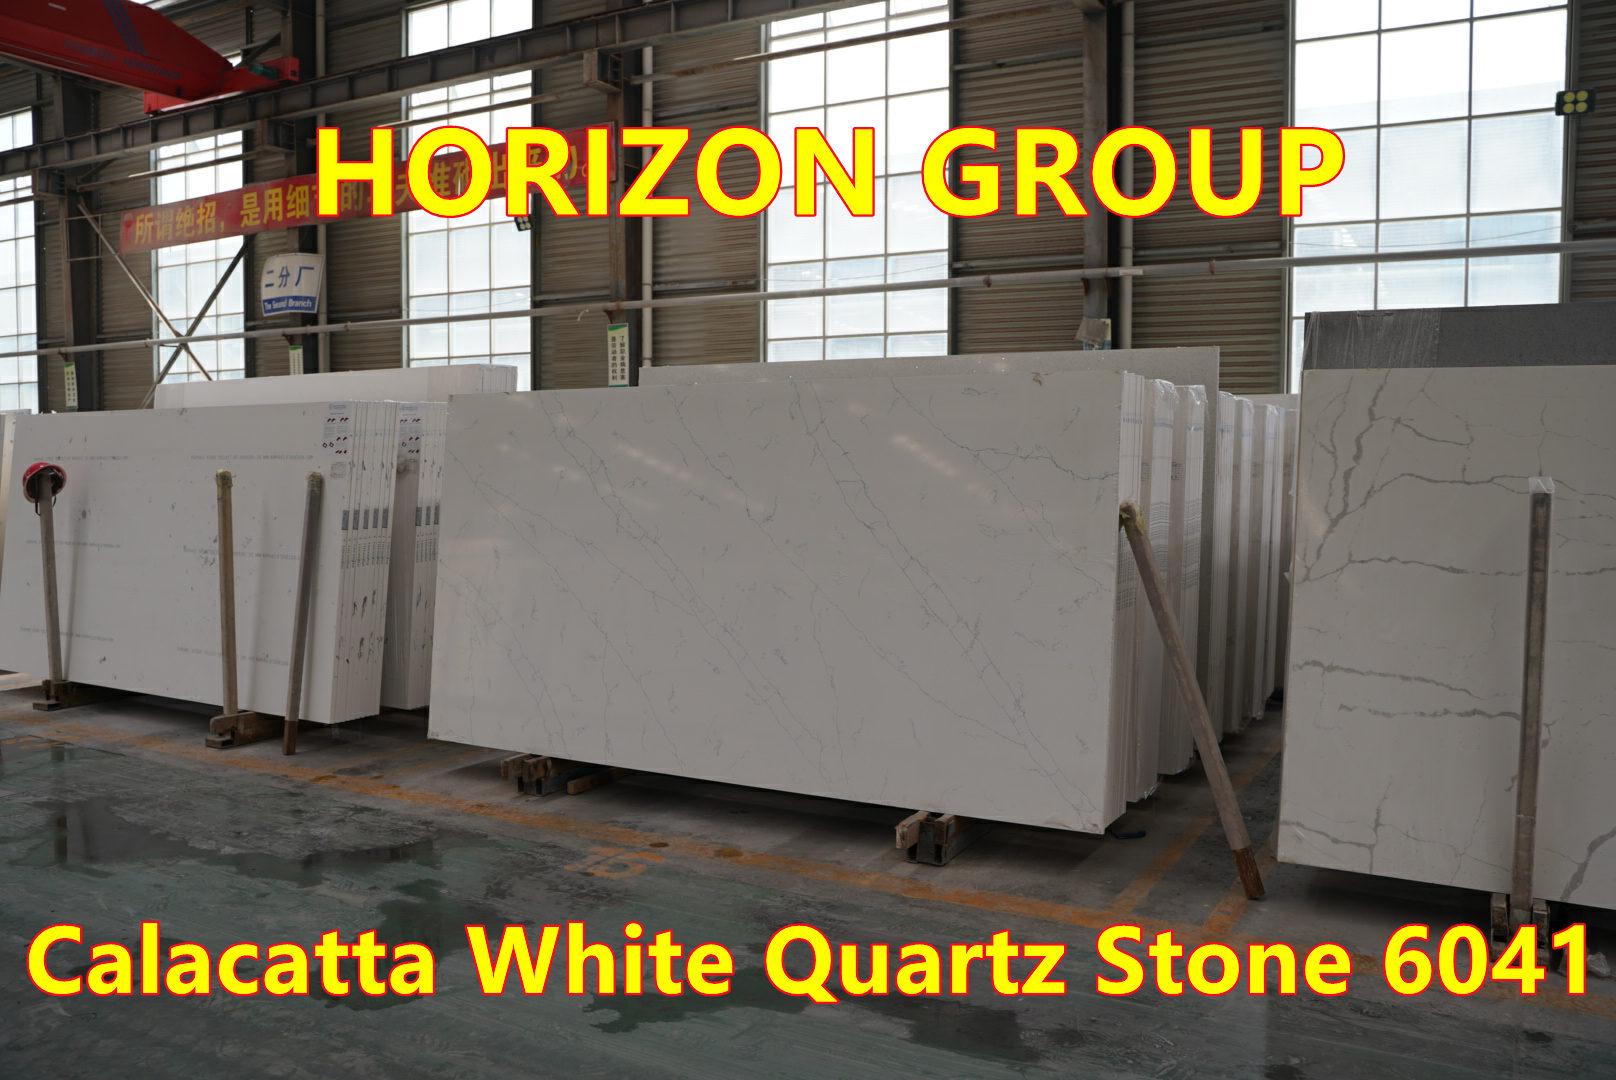 Quartz Calacatta White 6041 - Horizon Group